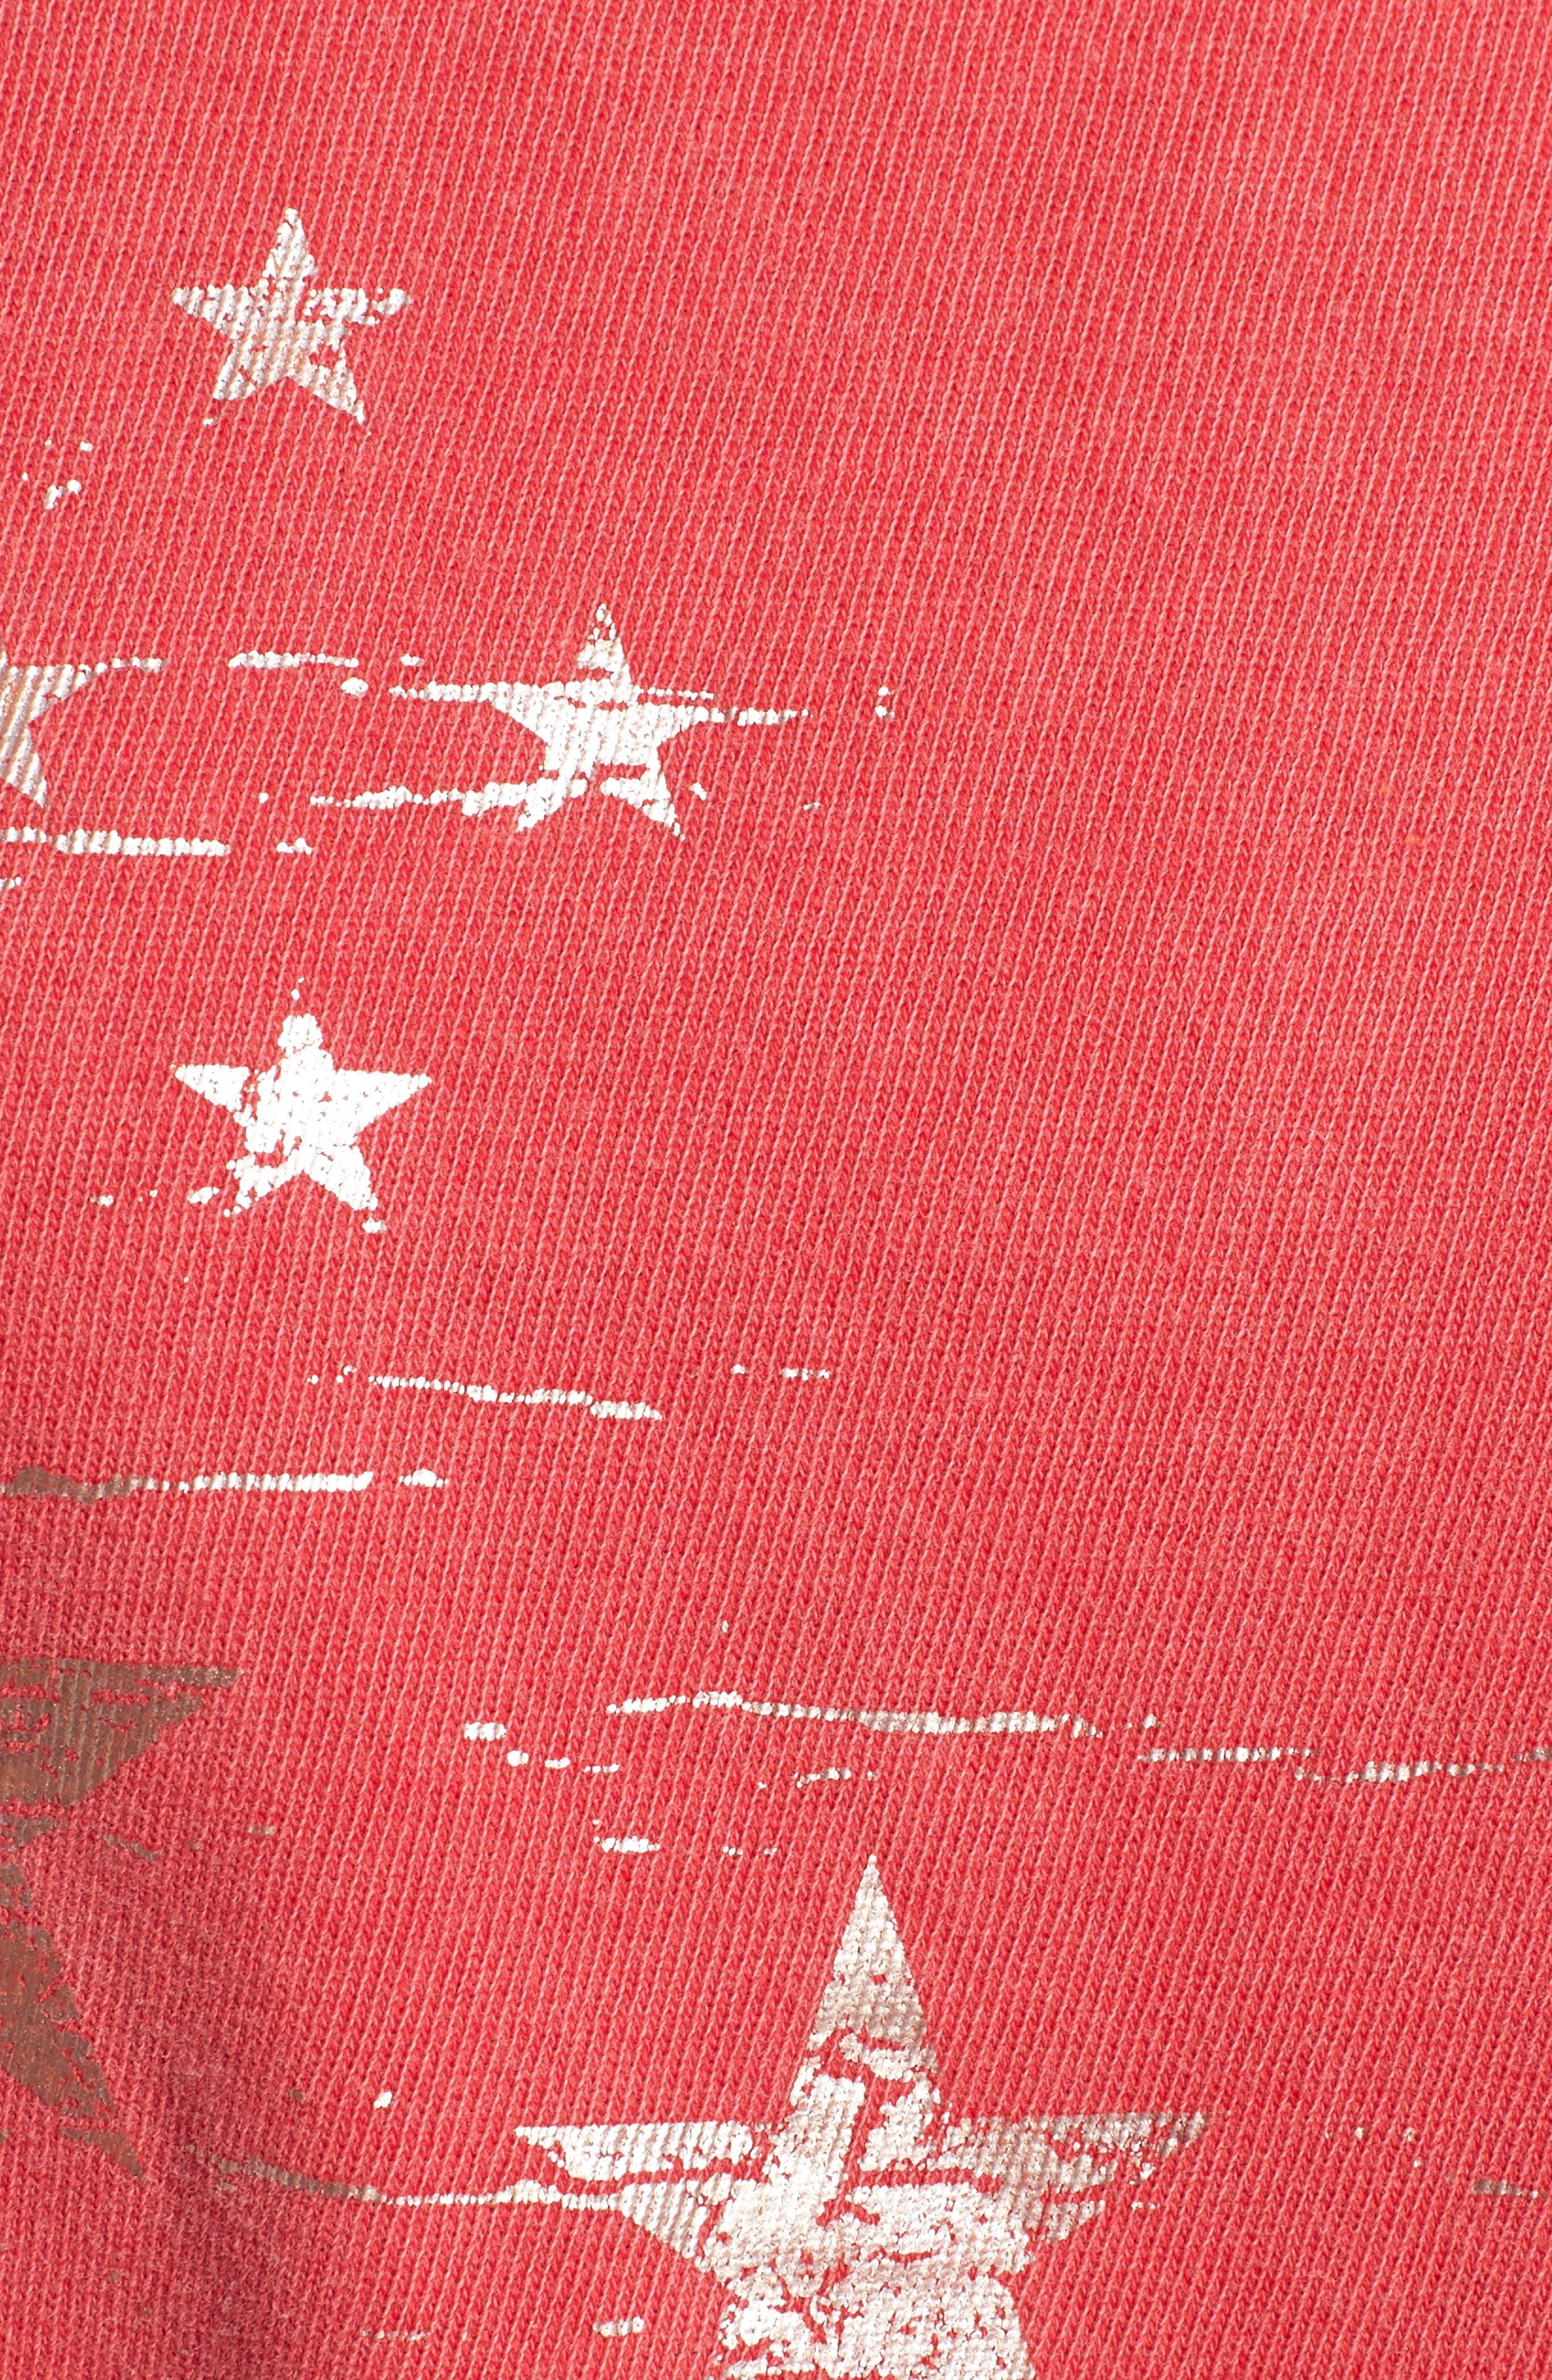 Foil Star Sweatshirt,                             Alternate thumbnail 6, color,                             Scarlet